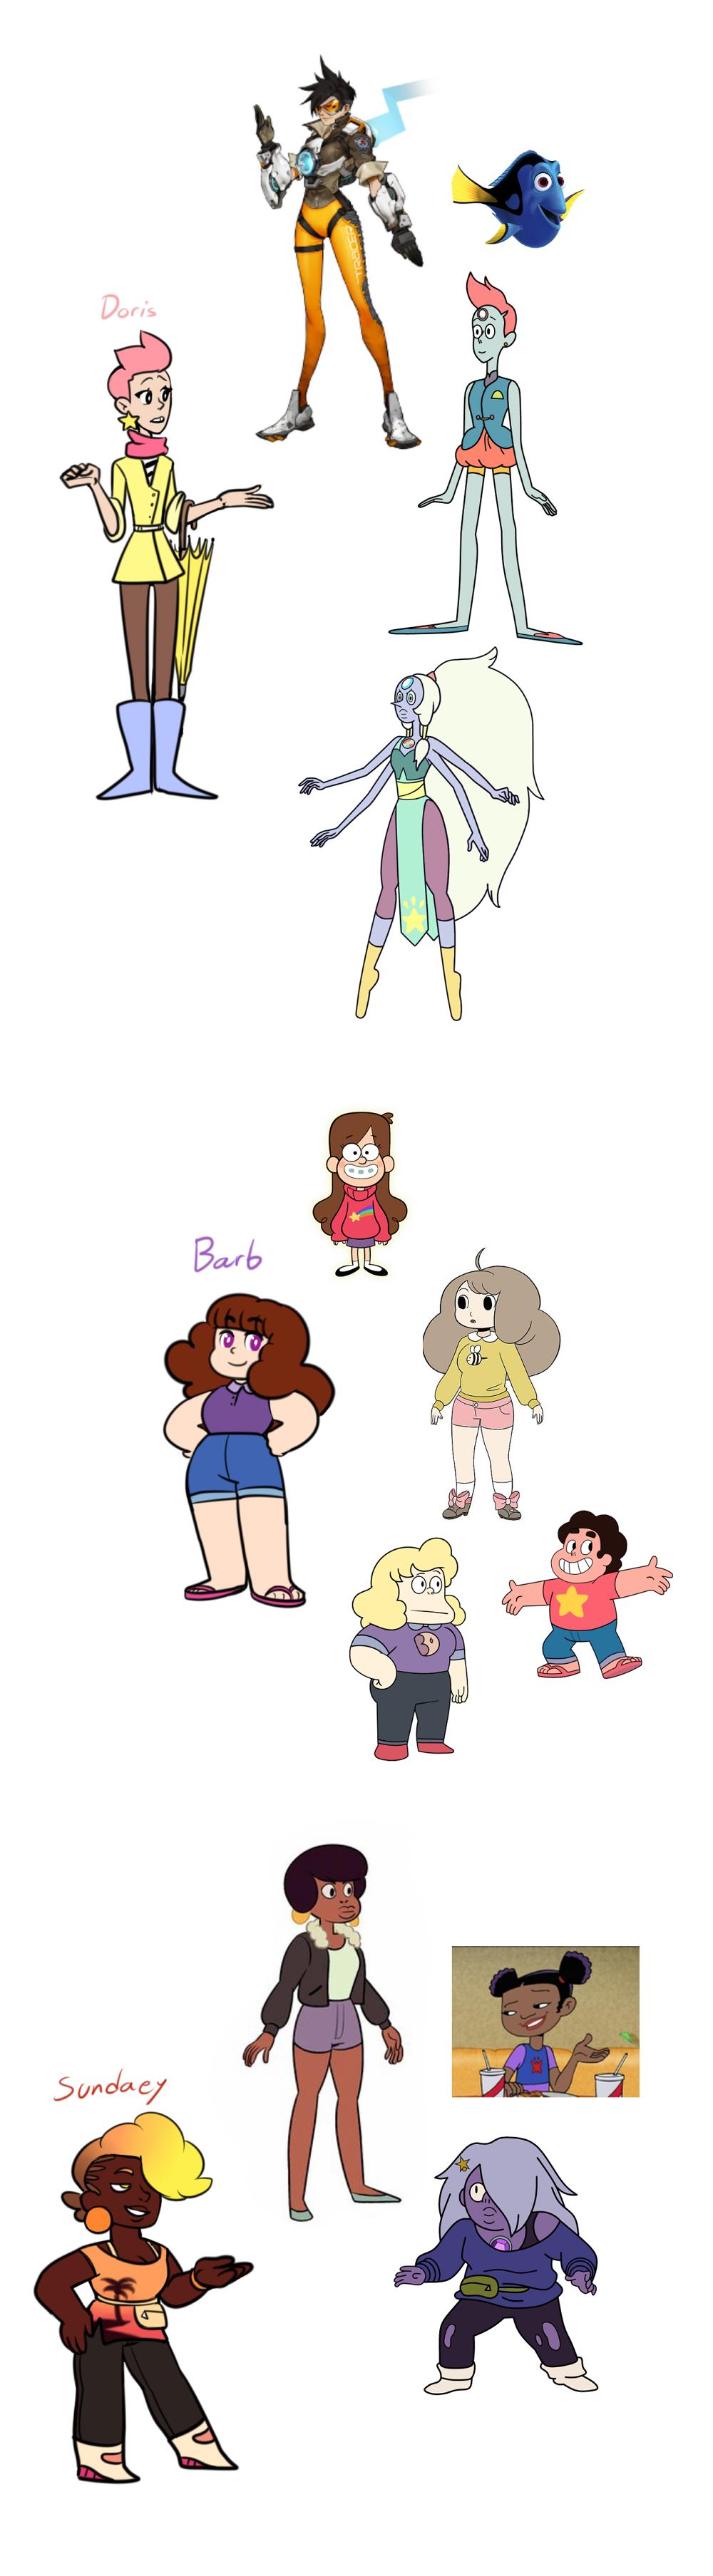 Cartoon Character Design Inspiration : Character design inspiration by kattinx on deviantart